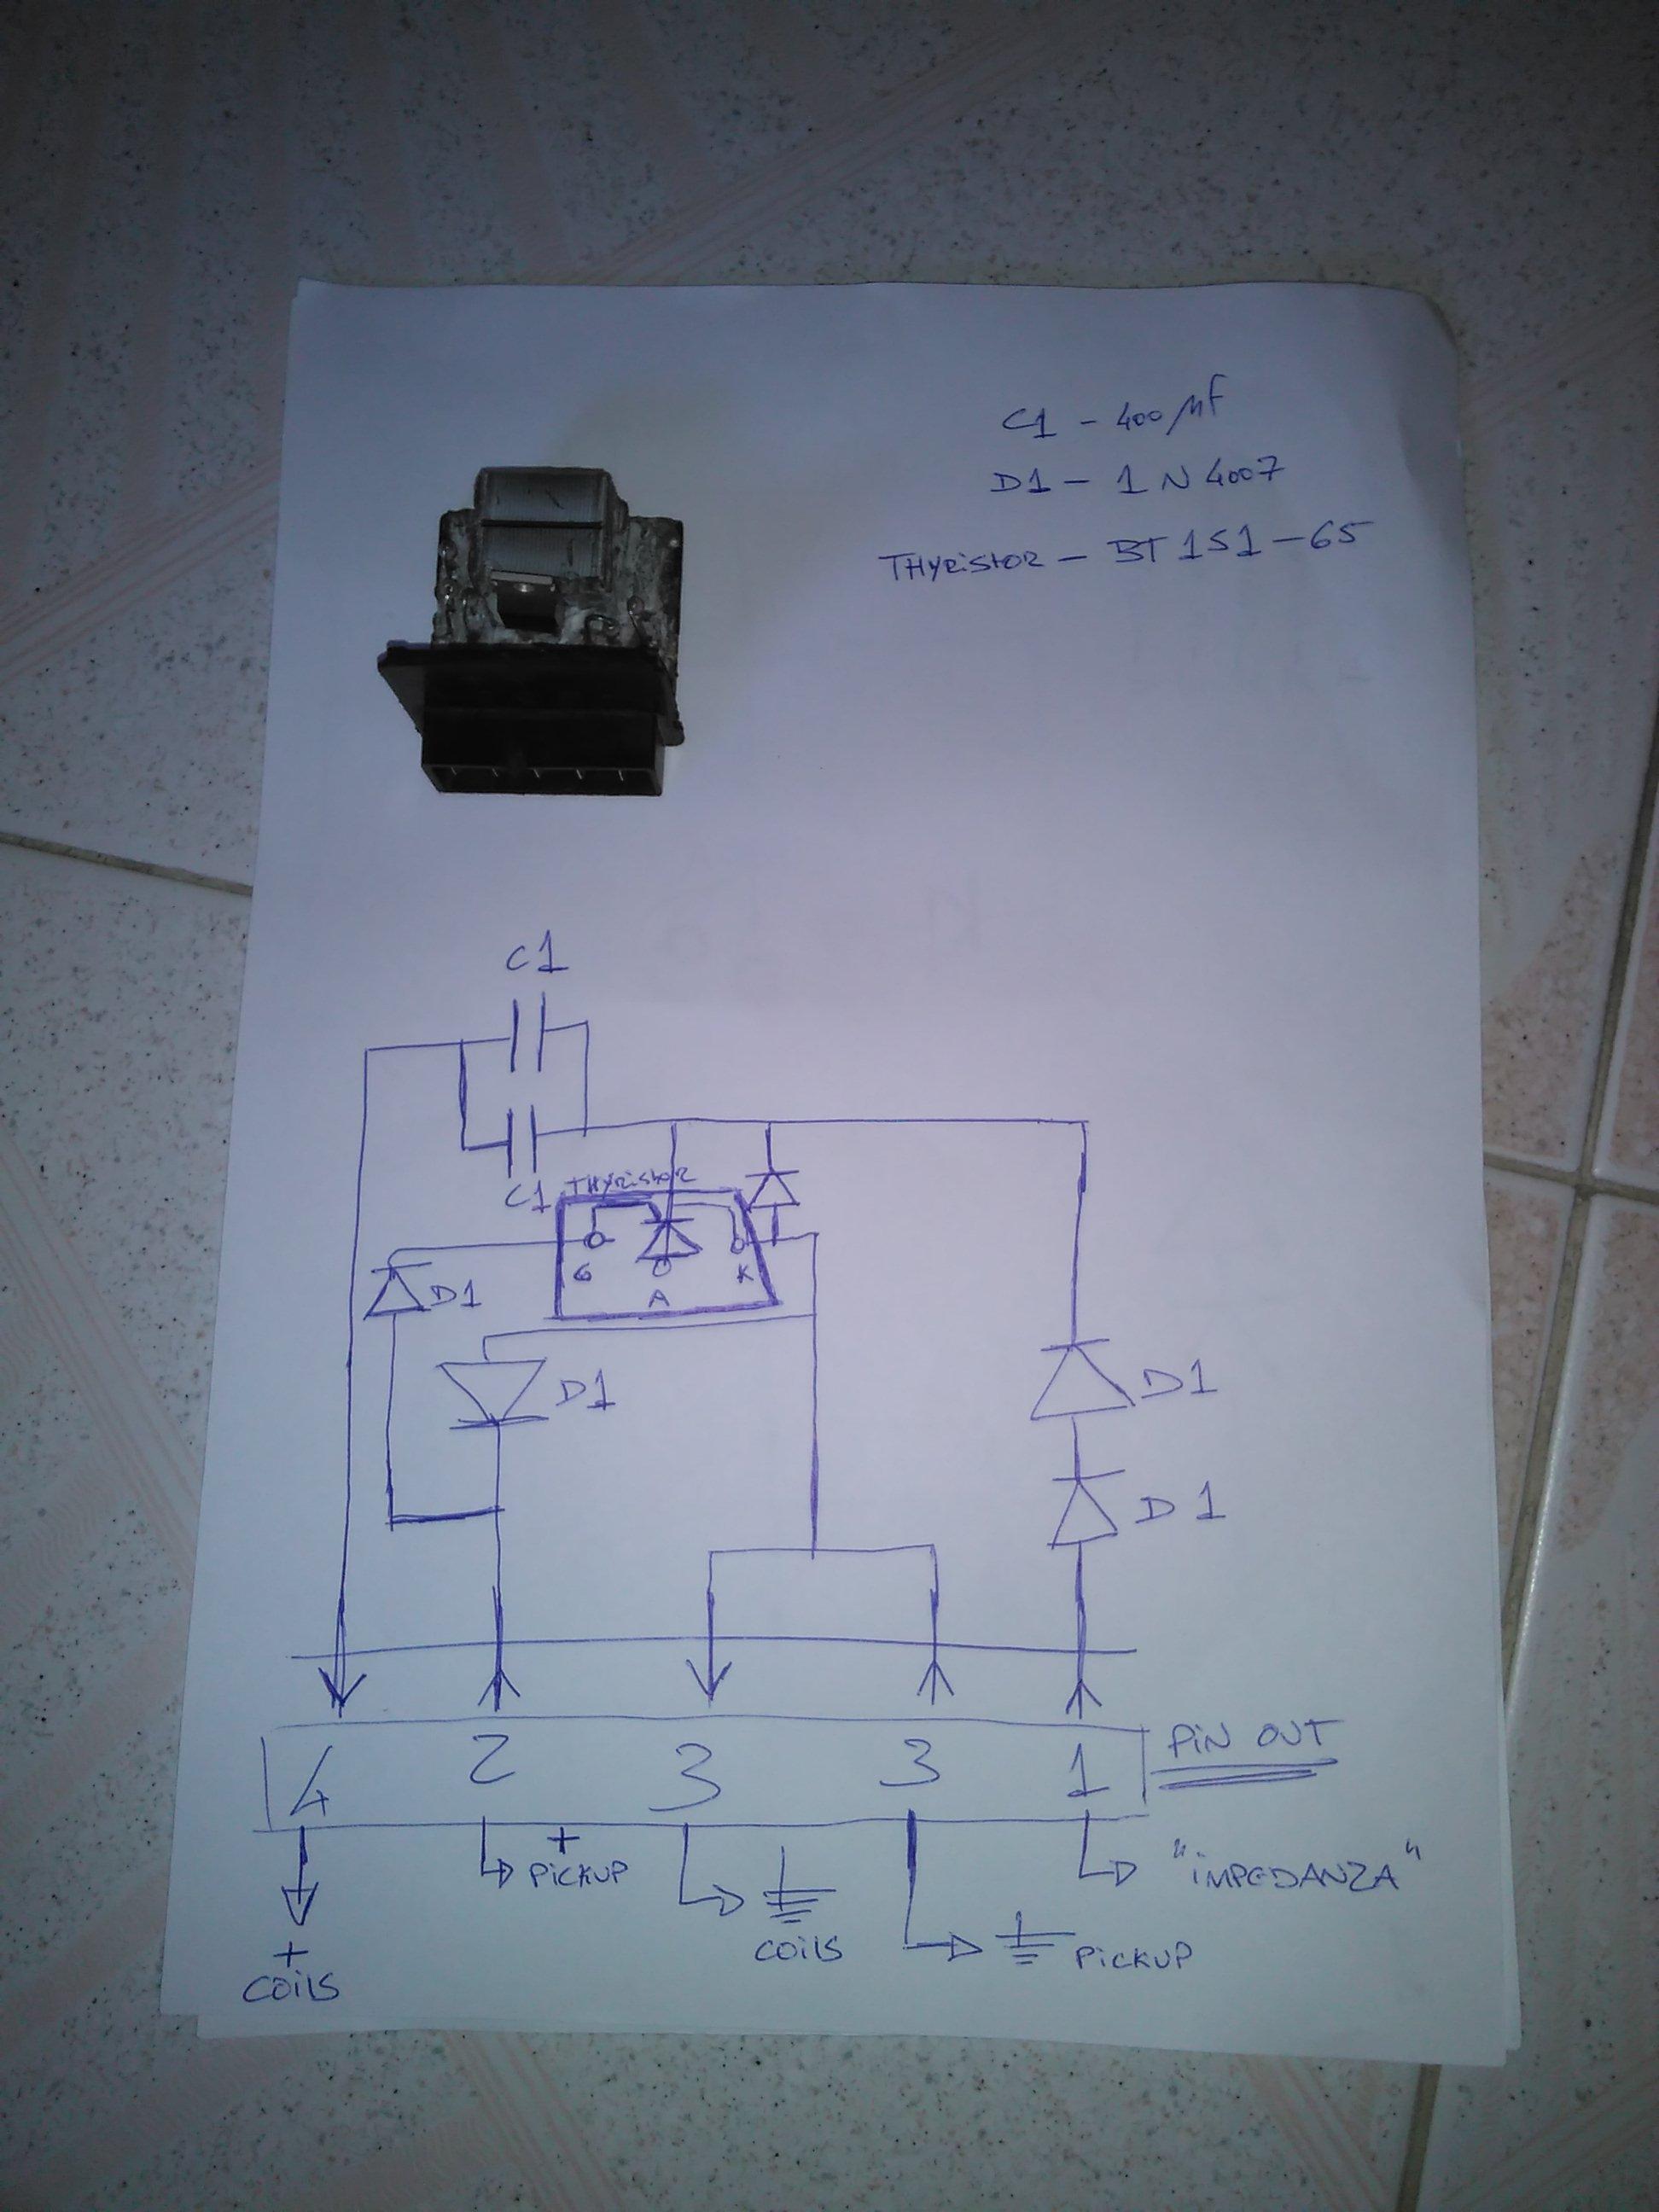 125 Sport electrical problems-img_20150515_191145.jpg